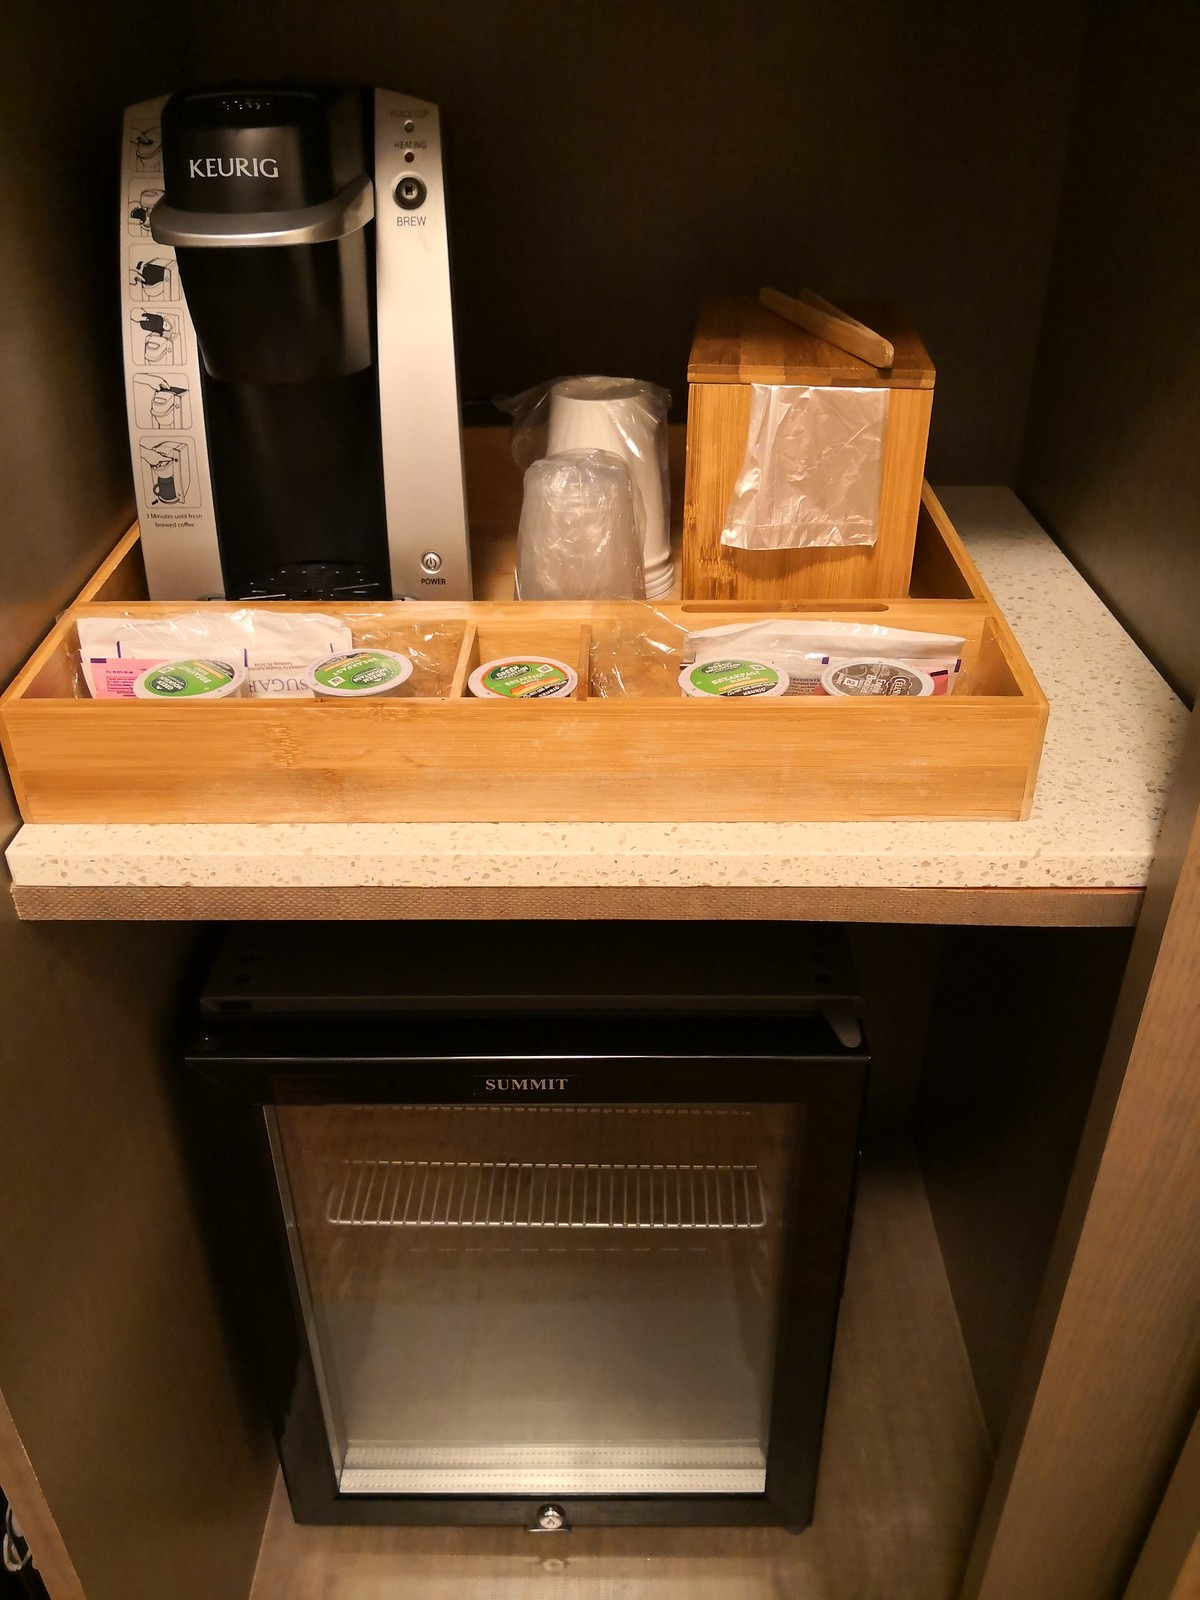 Coffee maker and empty mini fridge